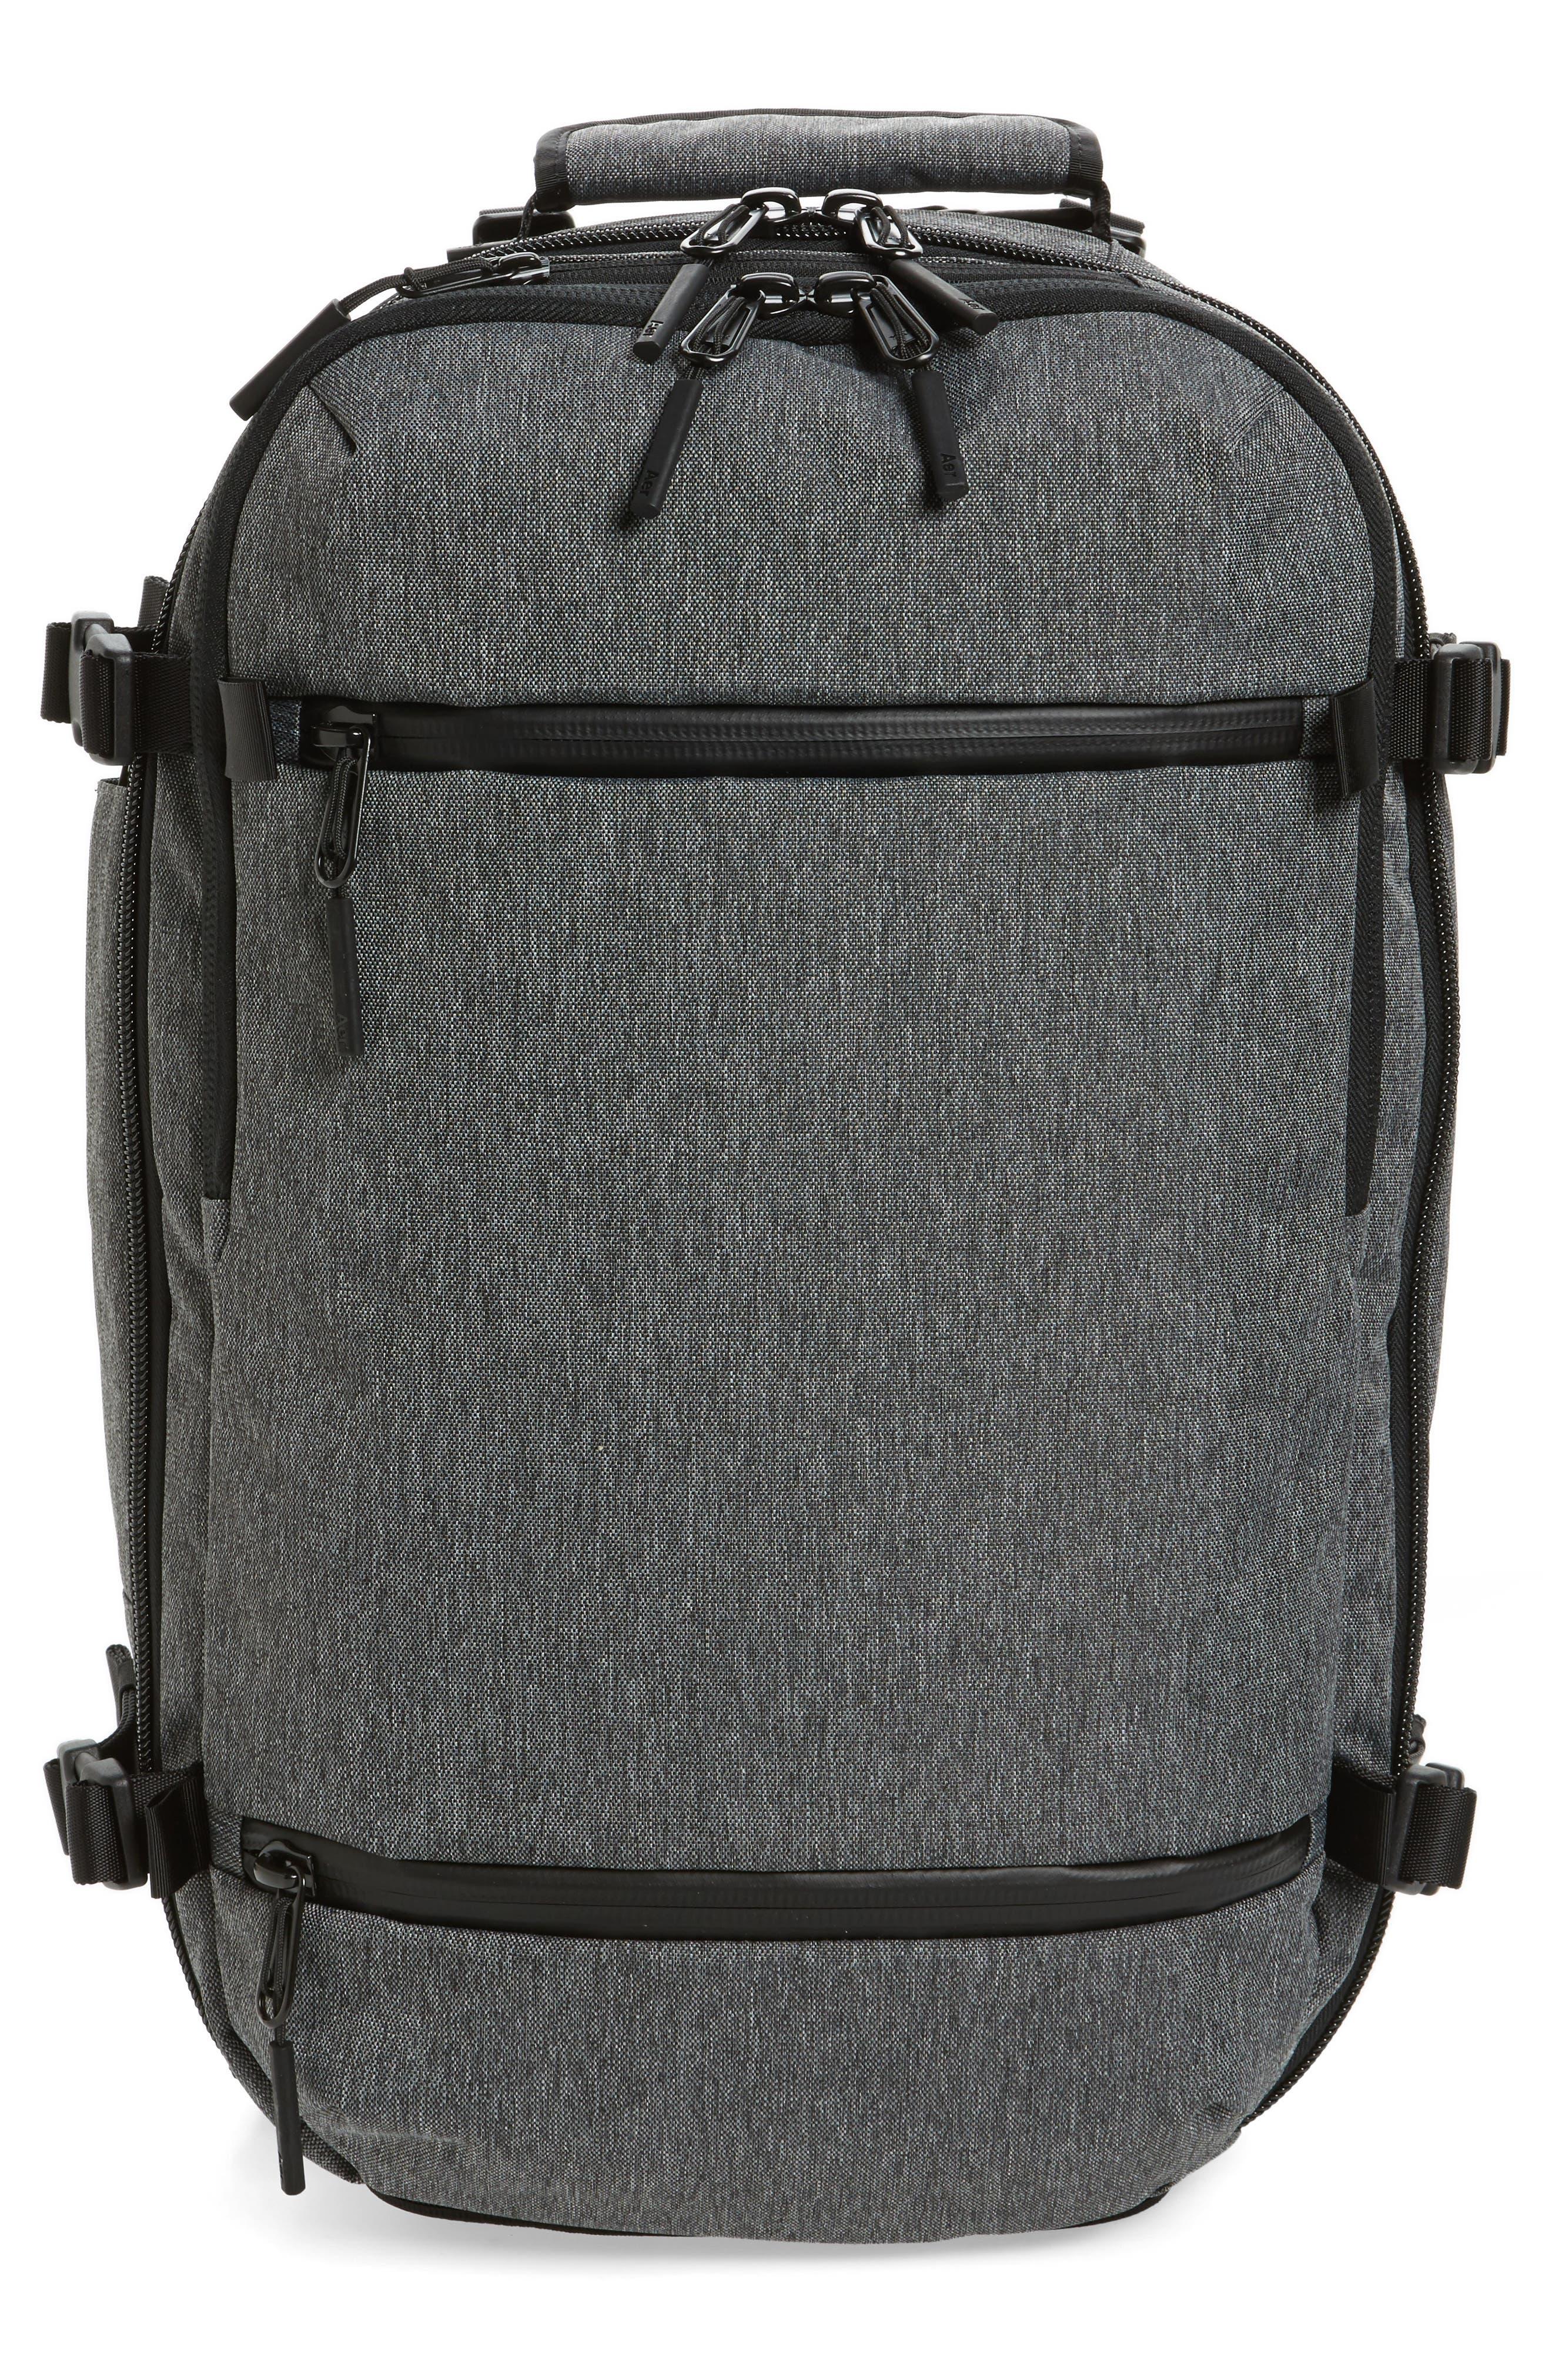 Travel Pack Backpack,                             Main thumbnail 1, color,                             Grey